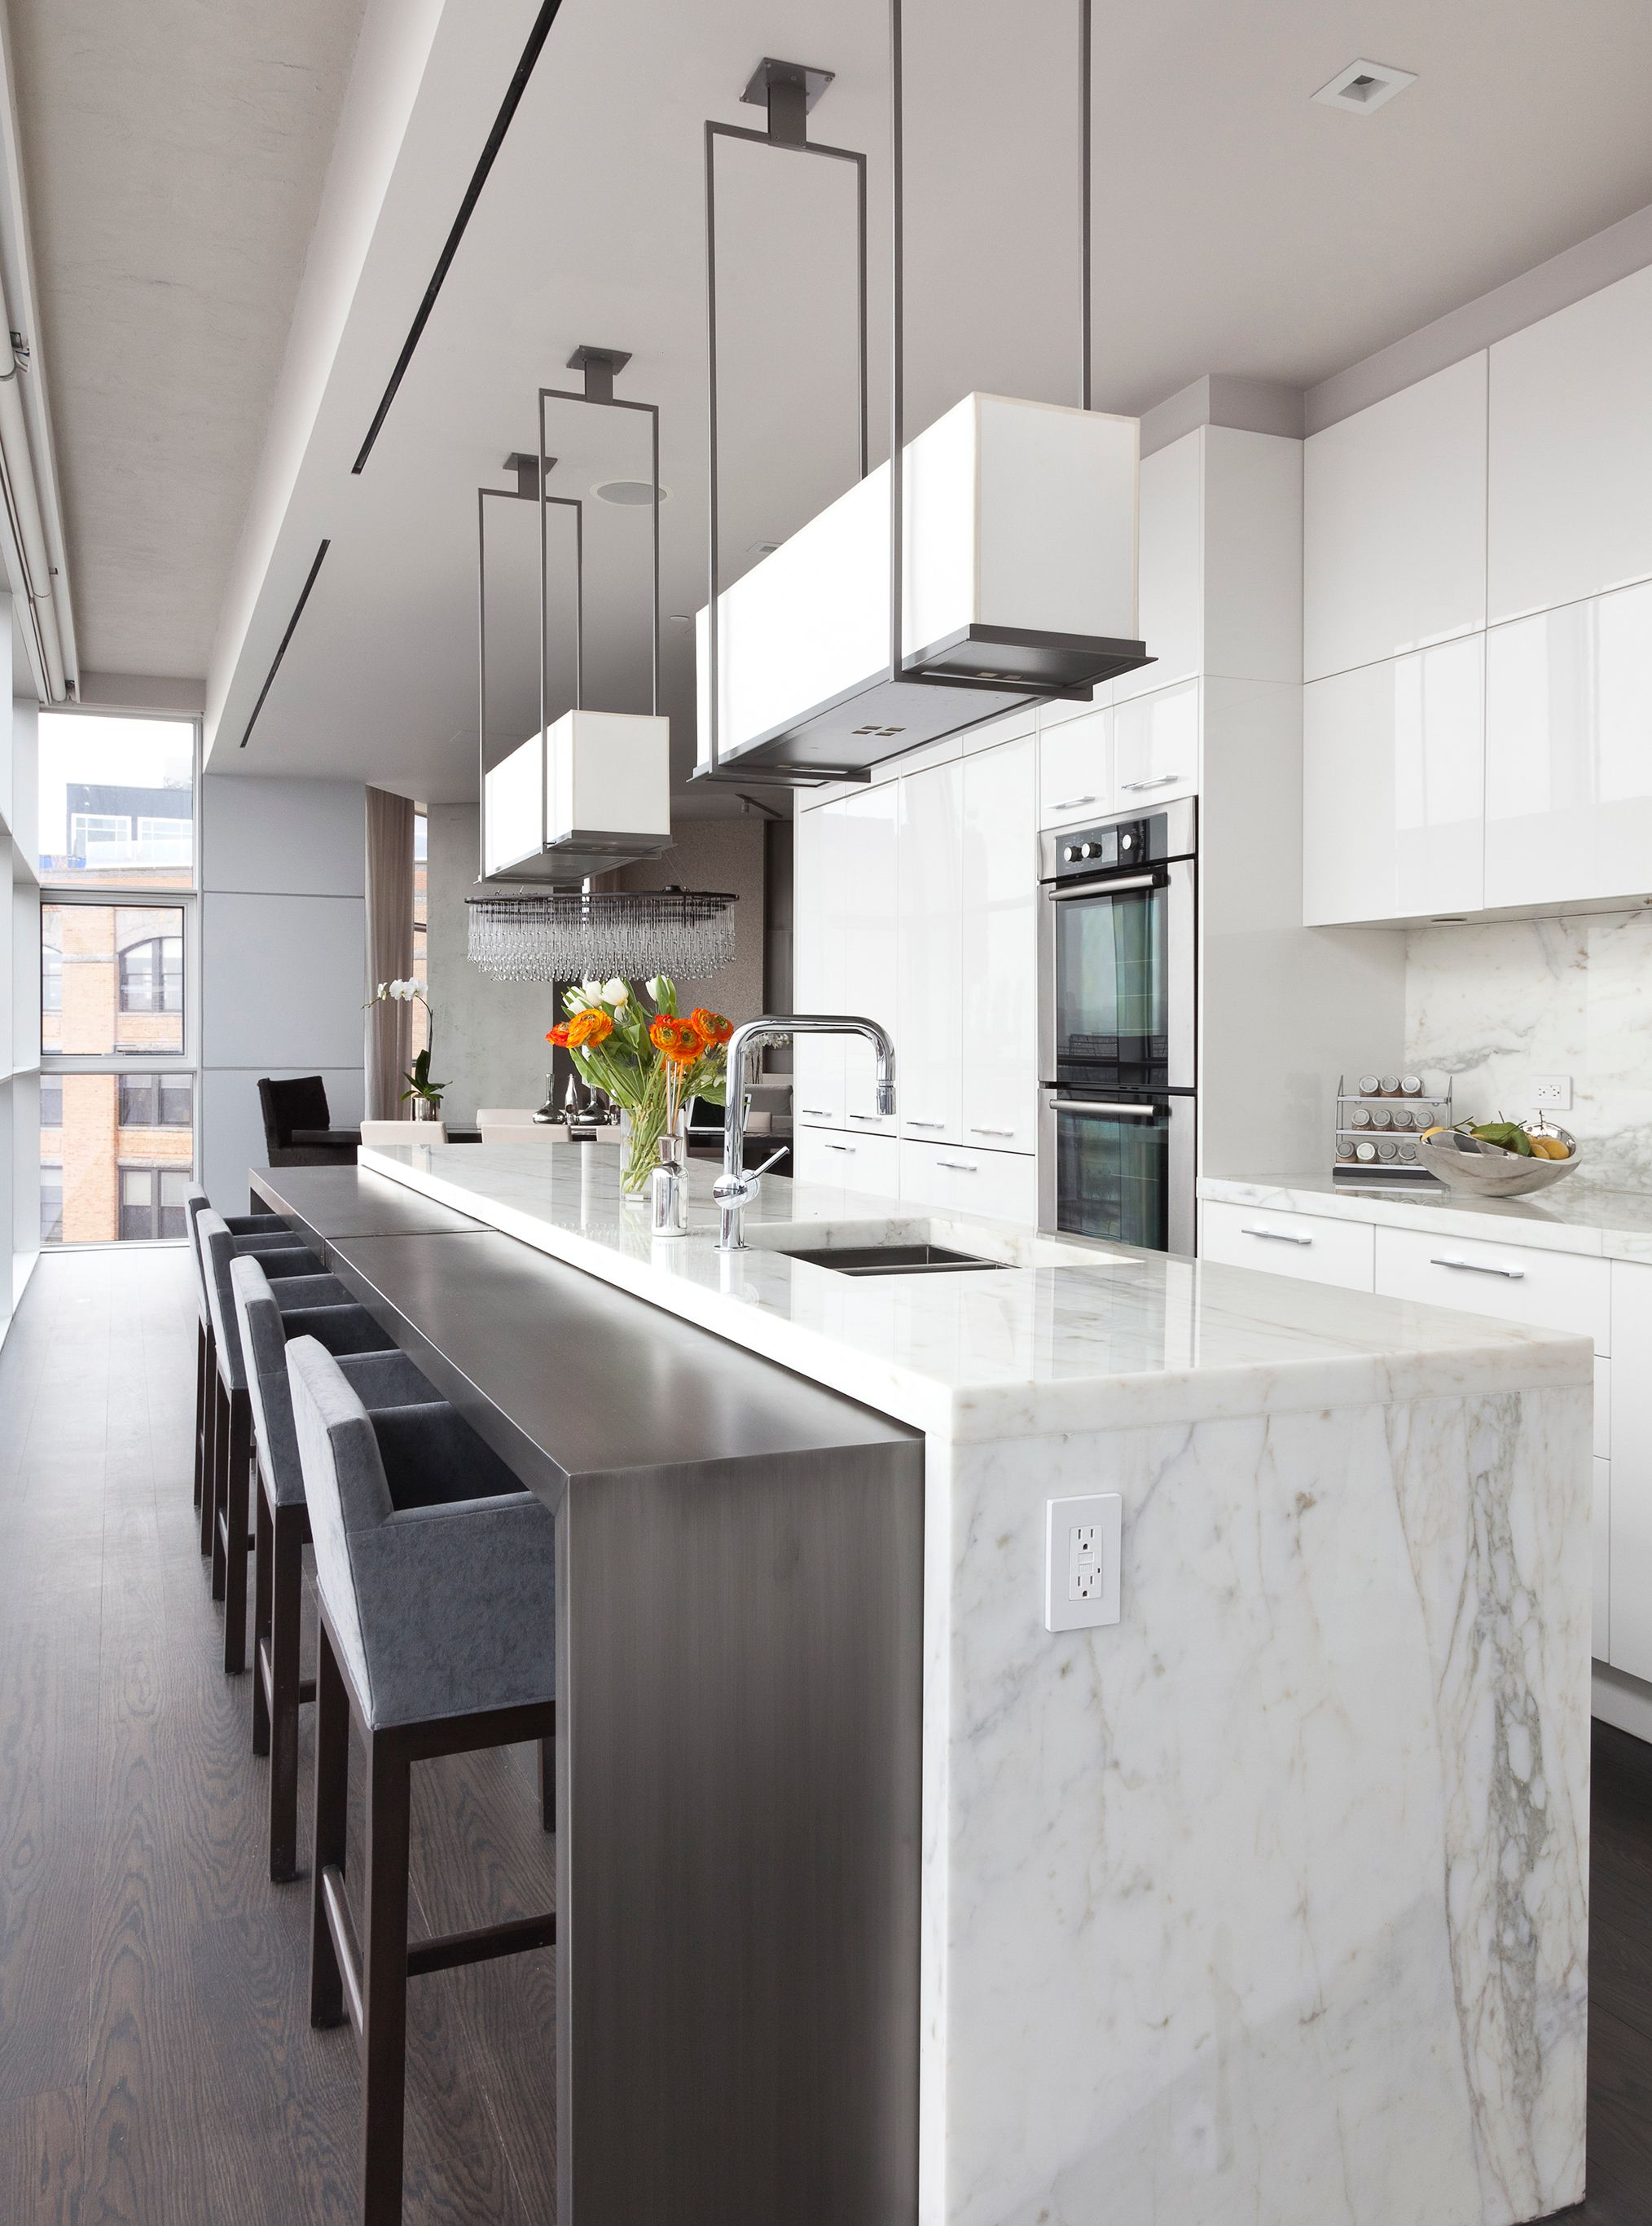 tribeca penthouse | kitchen ideas | pinterest | luxury kitchen